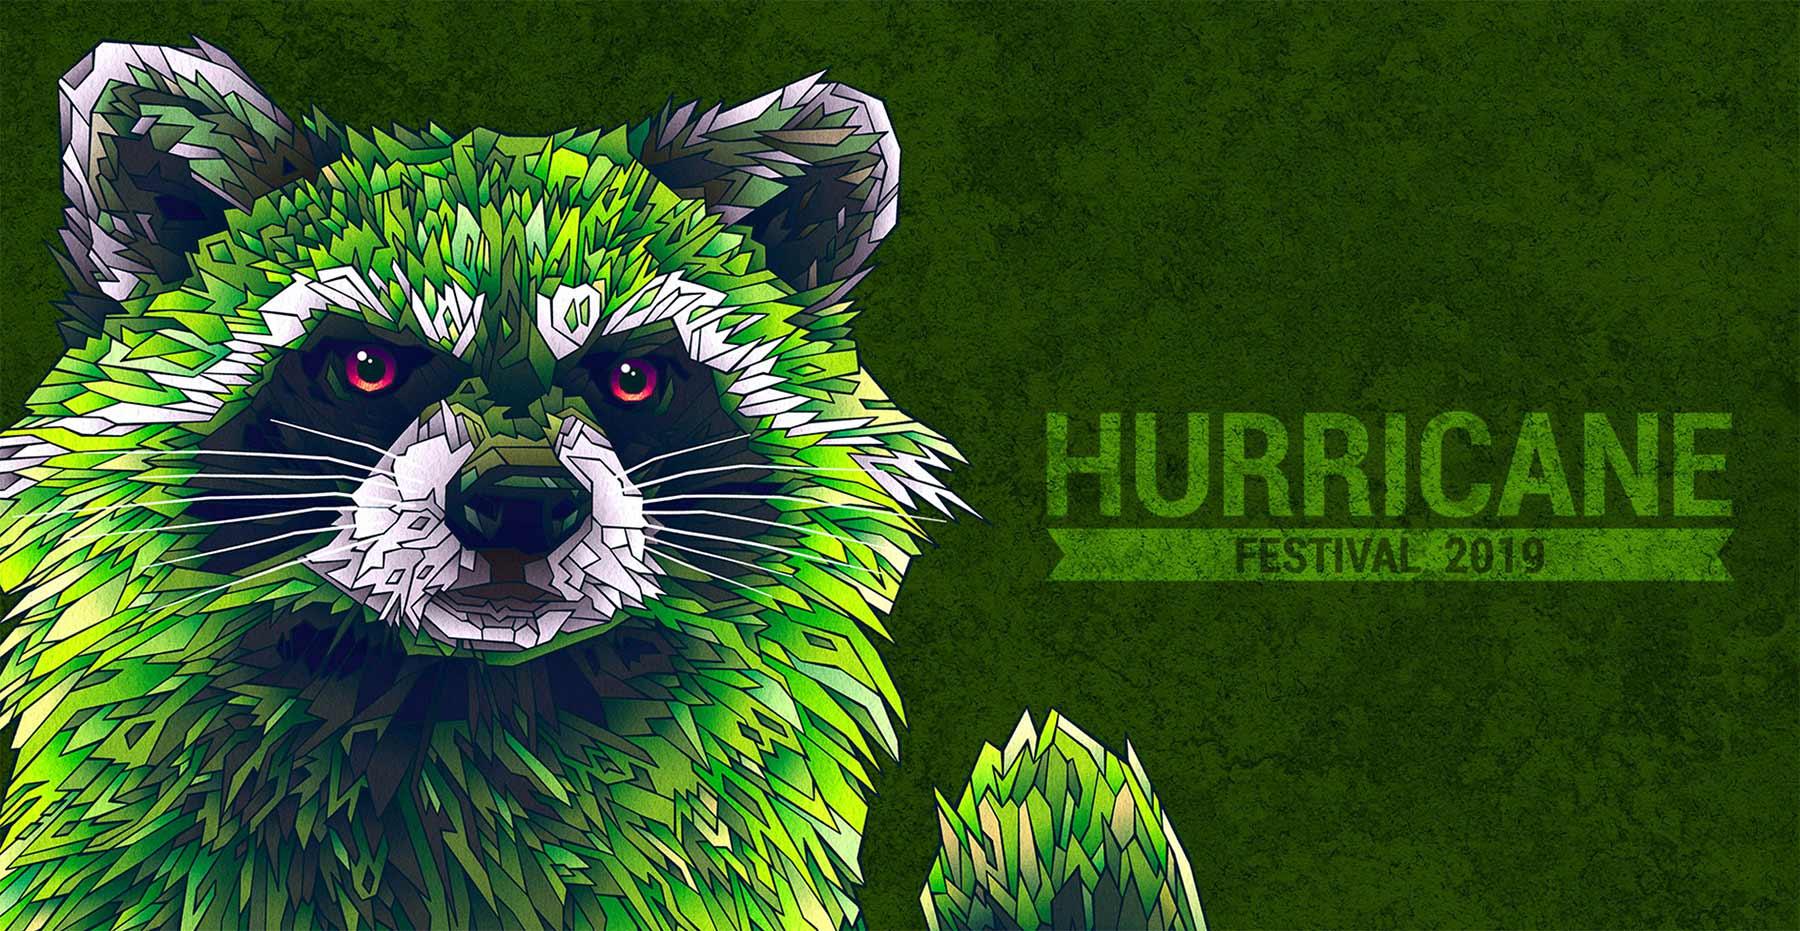 Hurricane Festival 2019: Livestreams von NDR und arte Hurricane-Festival-2019